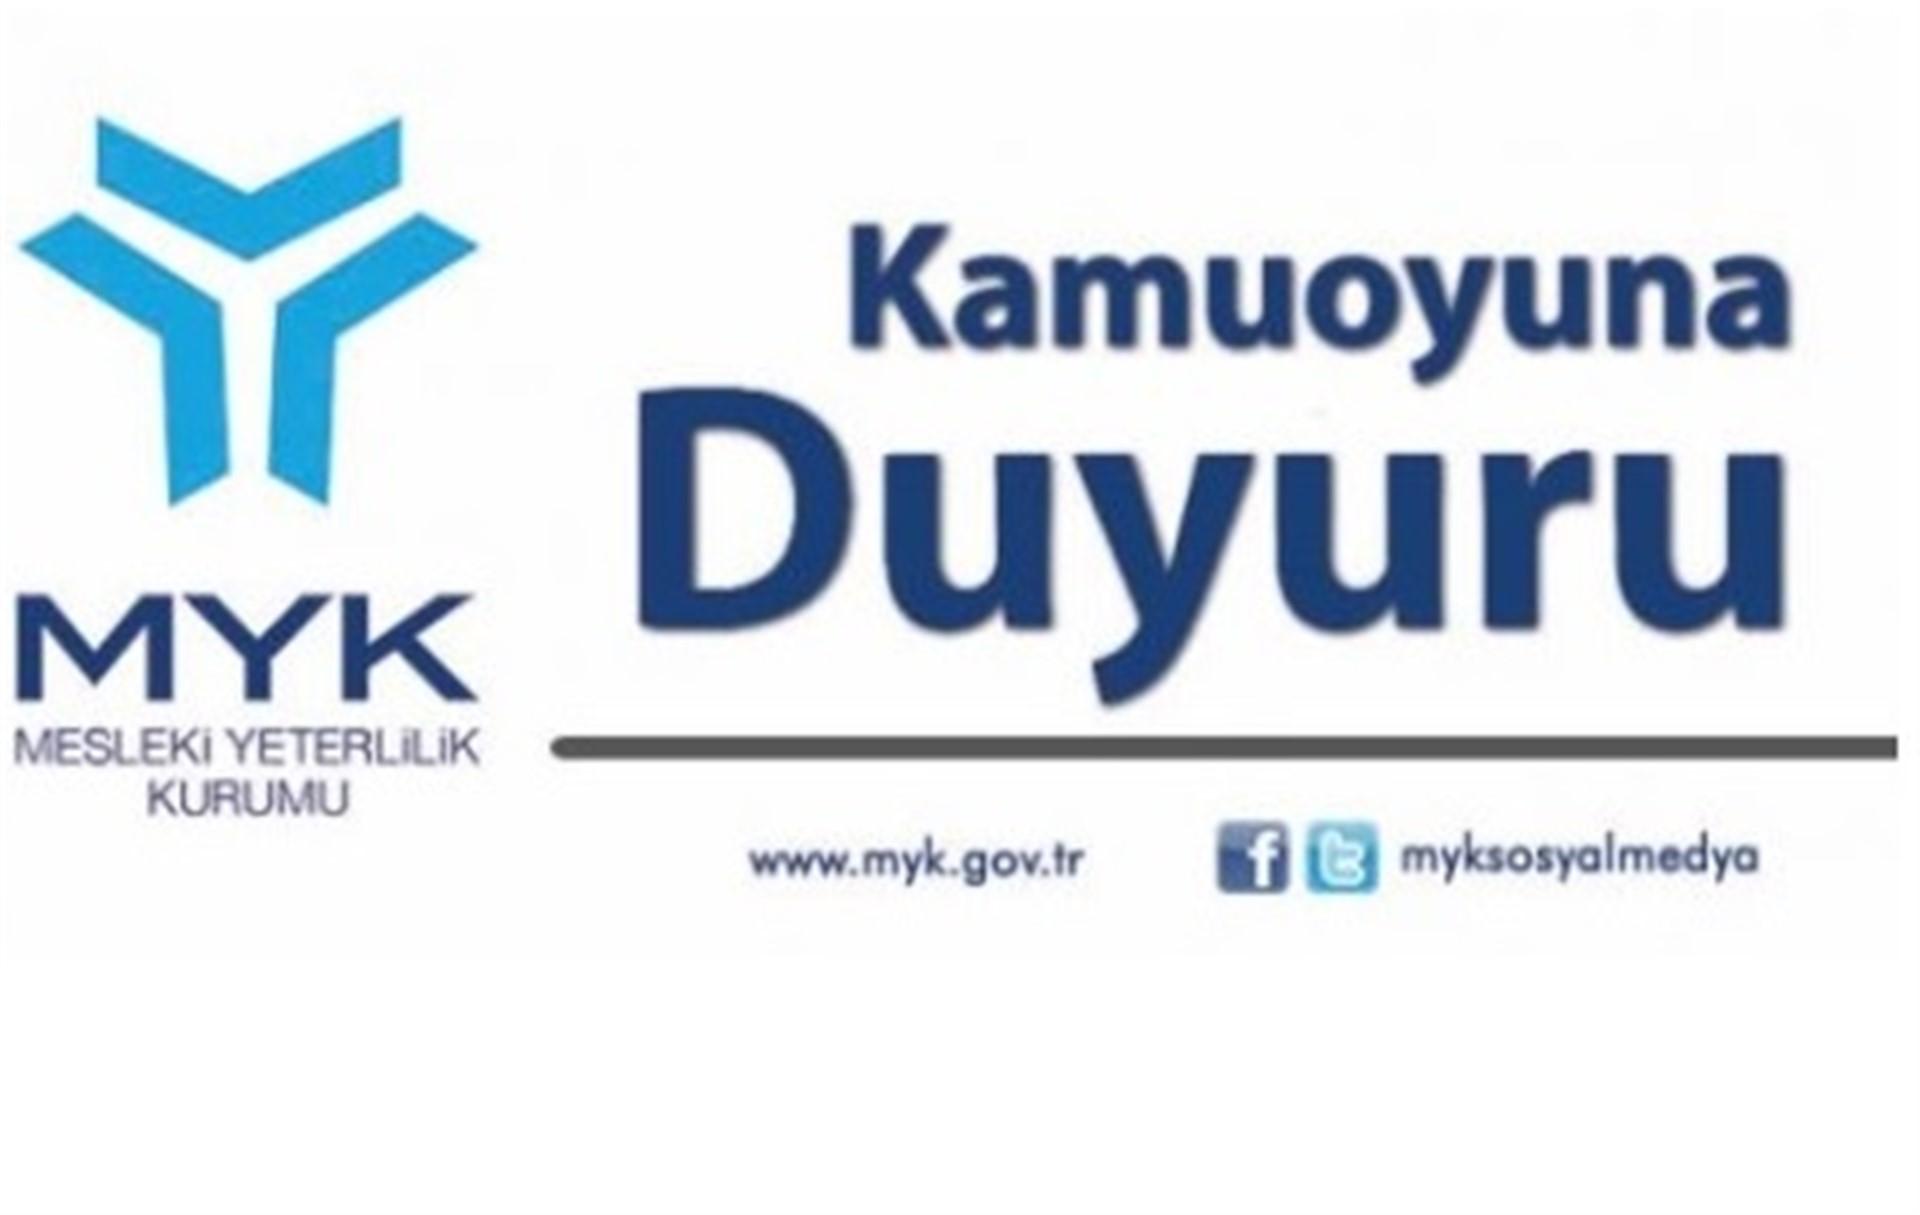 MYK Duyuruu (1920 x 1215)